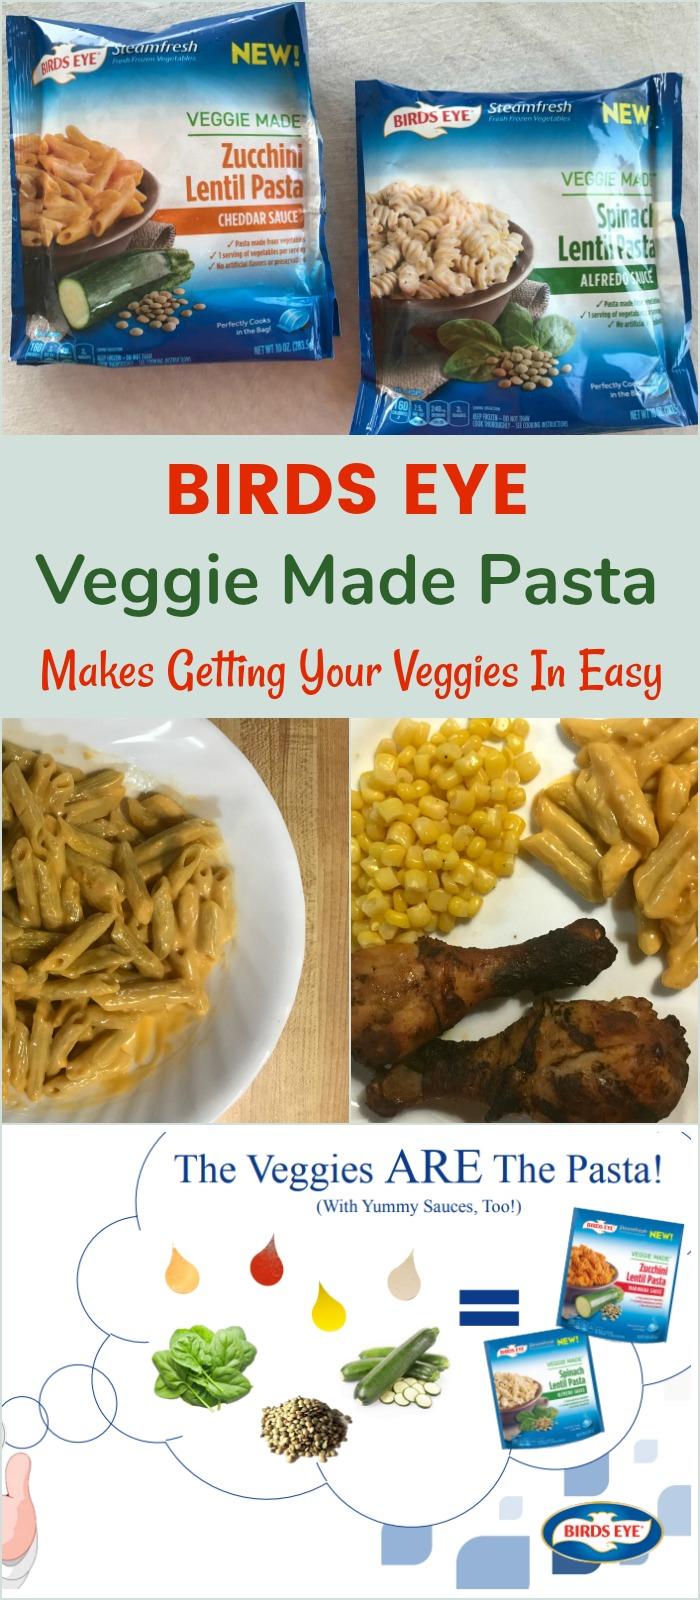 Birds Eye Veggie Made Pasta Makes Getting Your Veggies In Easy #SoVeggieGood #BirdsEyeVegetables